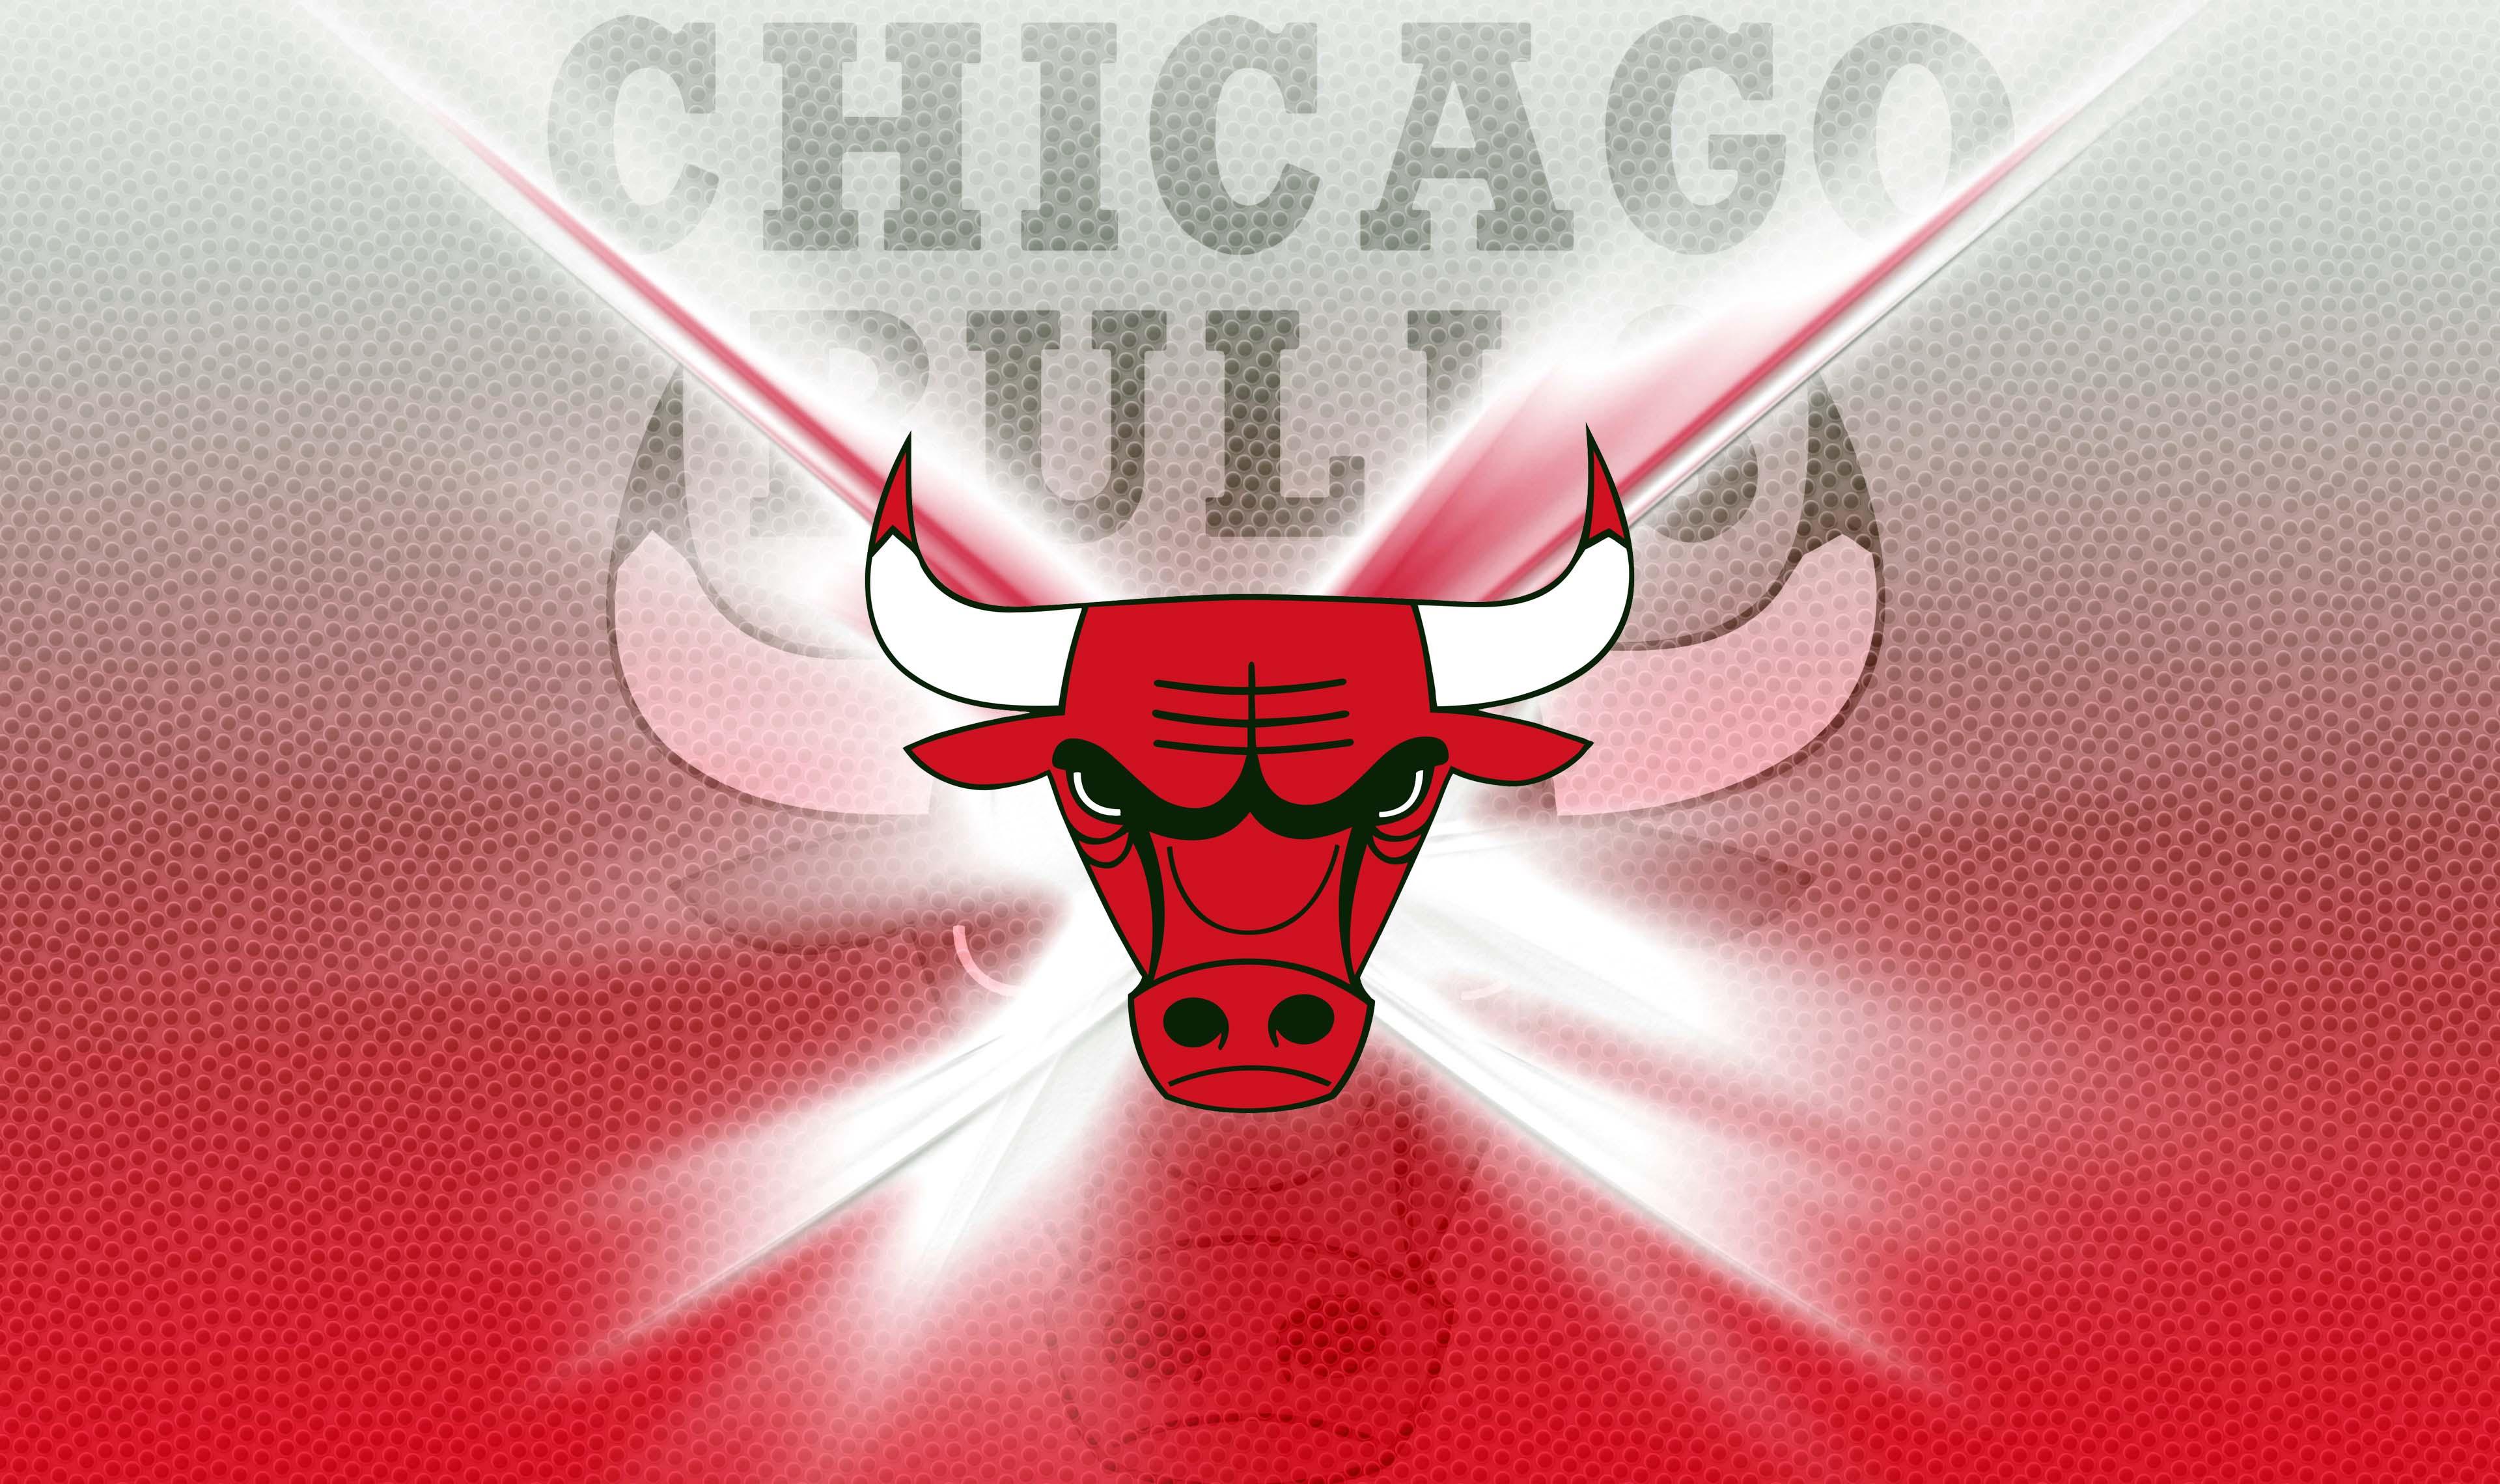 Nba Chicago Bulls Wallpapers Posted By Ryan Mercado